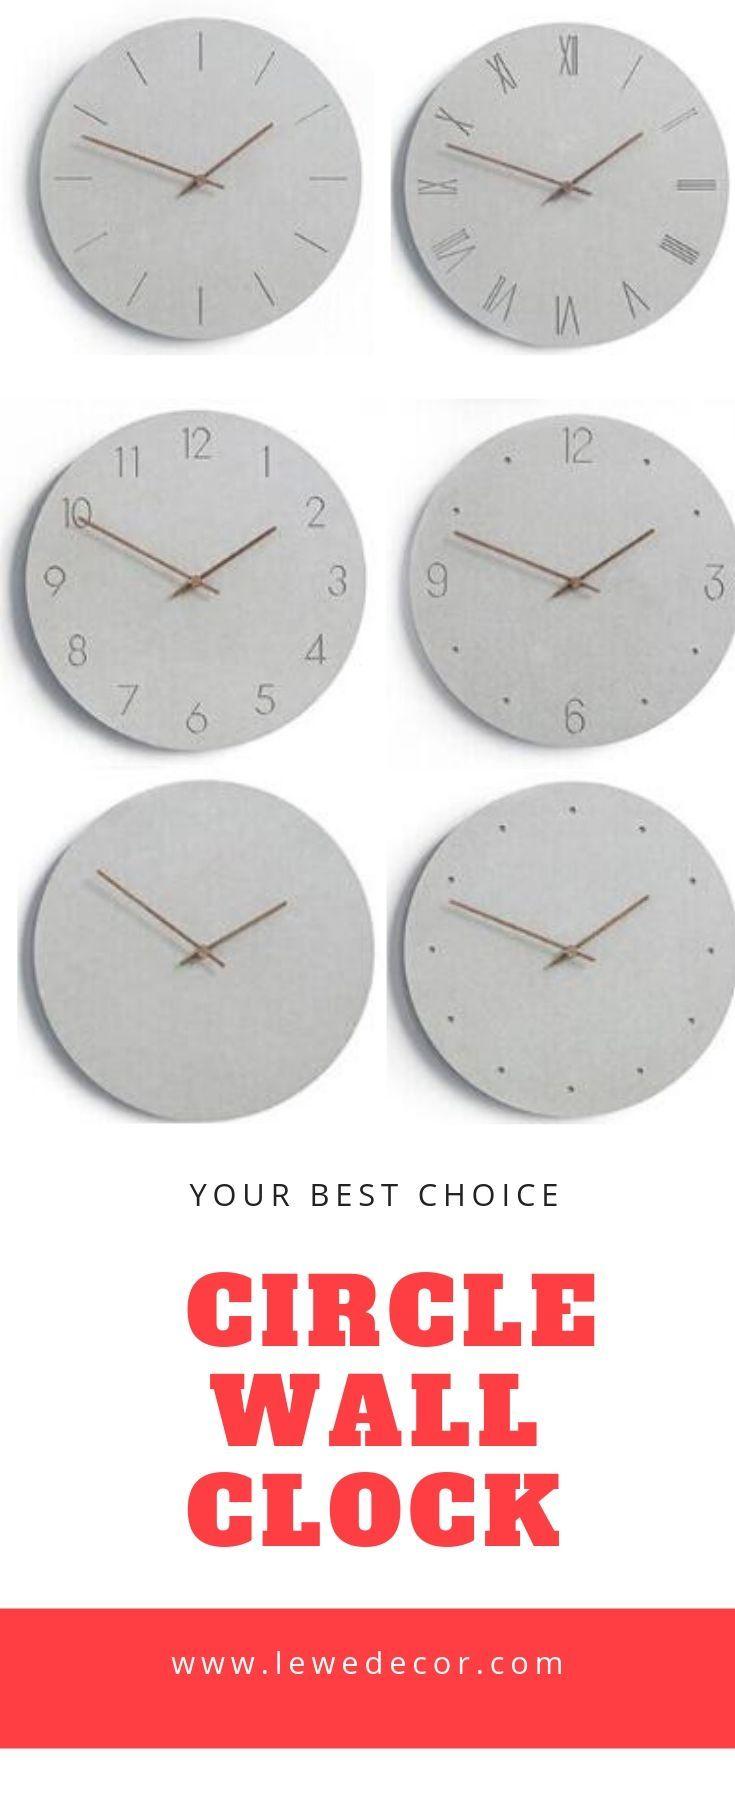 12 Inch Circle Wood Frameless Wall Clock Wall Clock Clock Wall Clock Modern